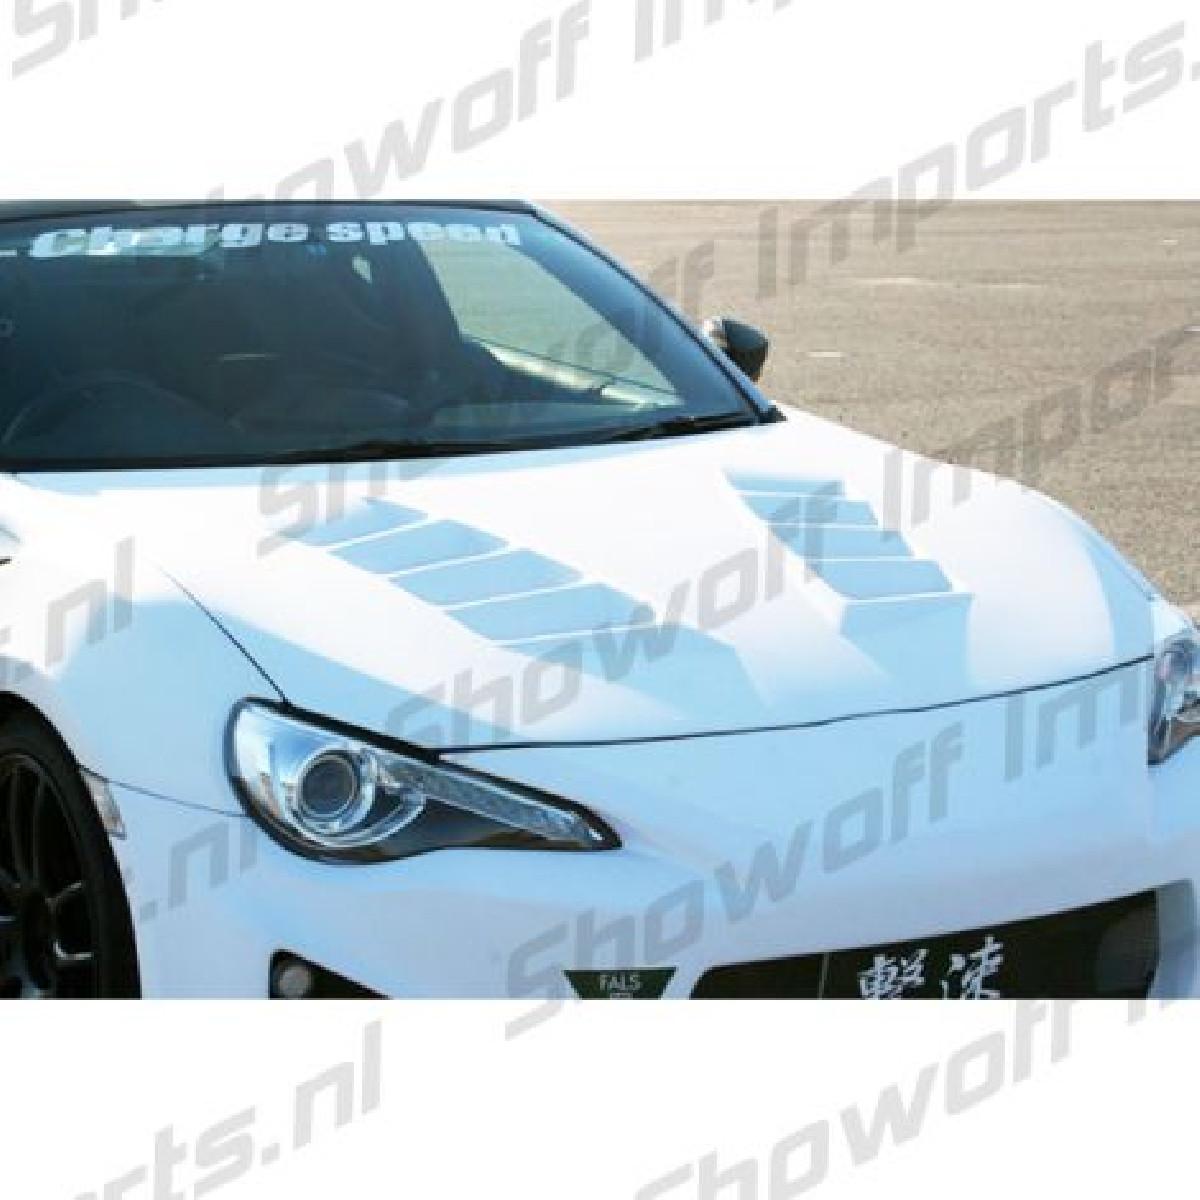 Subaru BRZ Chargespeed JDM Fiberglass Hood